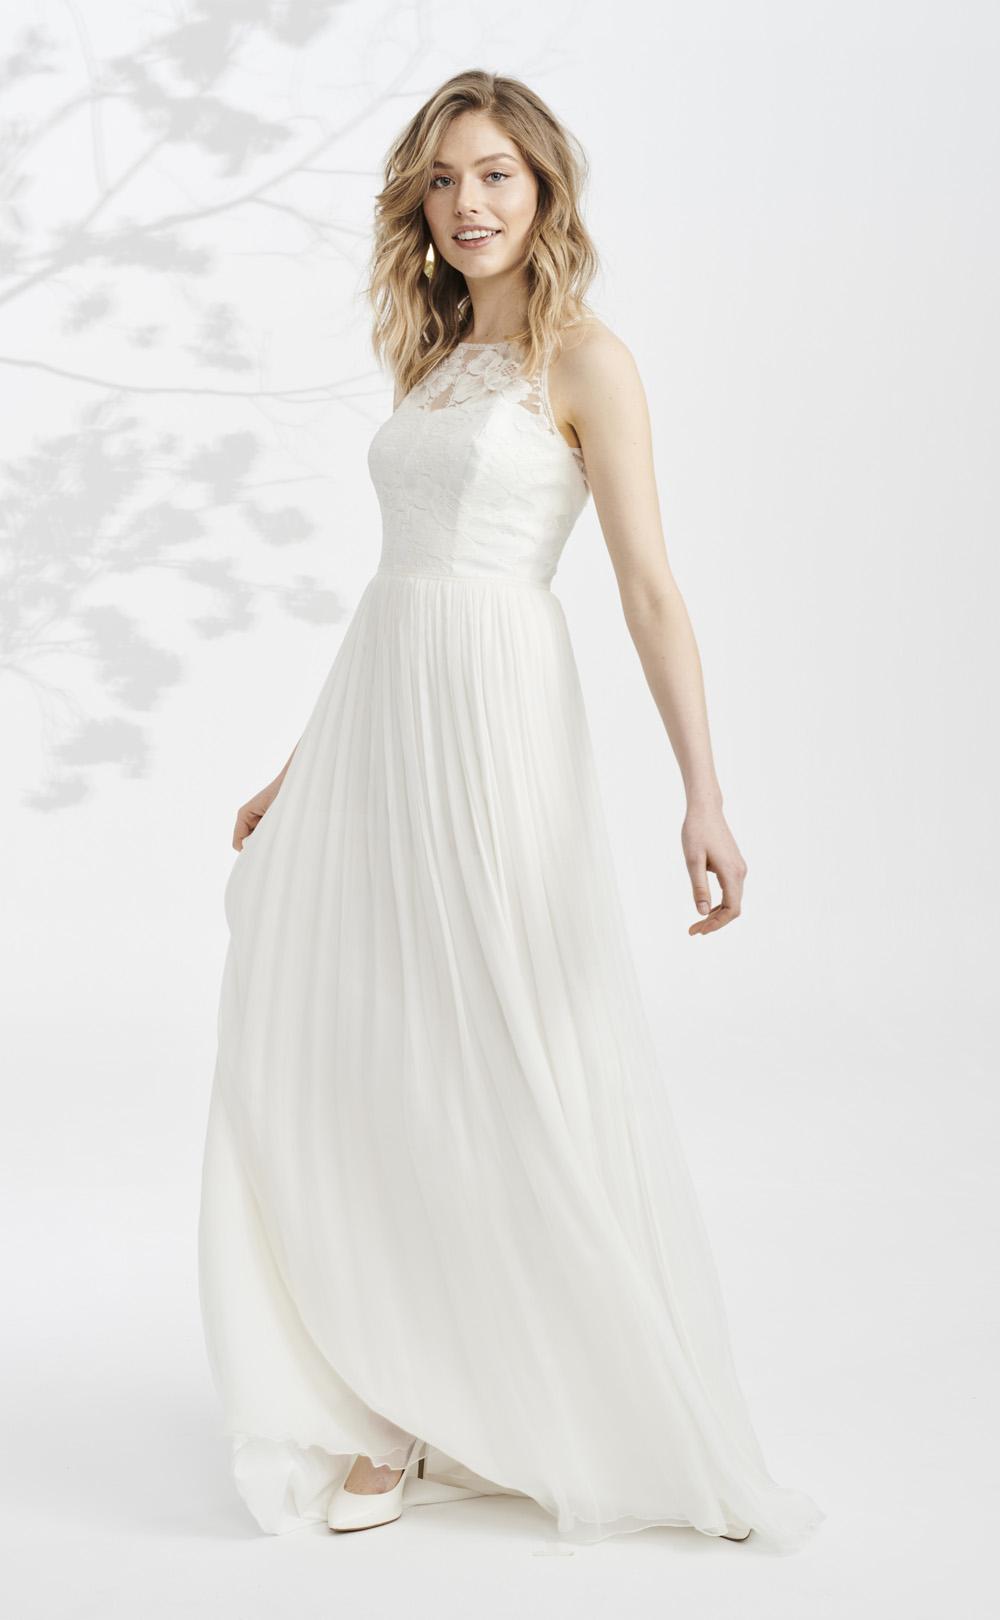 Fließendes Brautkleid: Palea